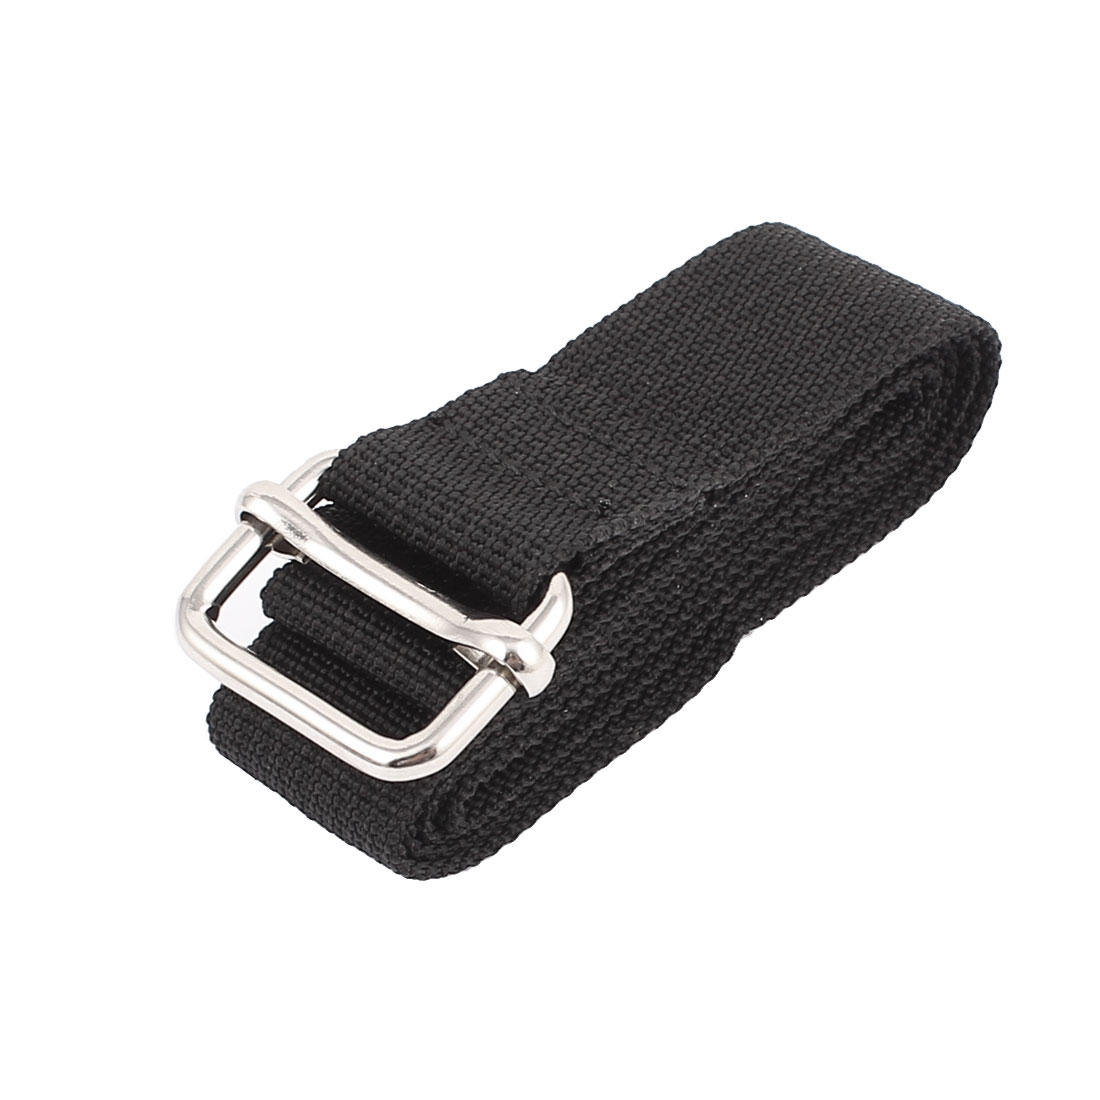 Outdoor Travel Metal Buckle Adjustable Luggage Suitcase Backpack Bag Strap Belt 1M x 25mm